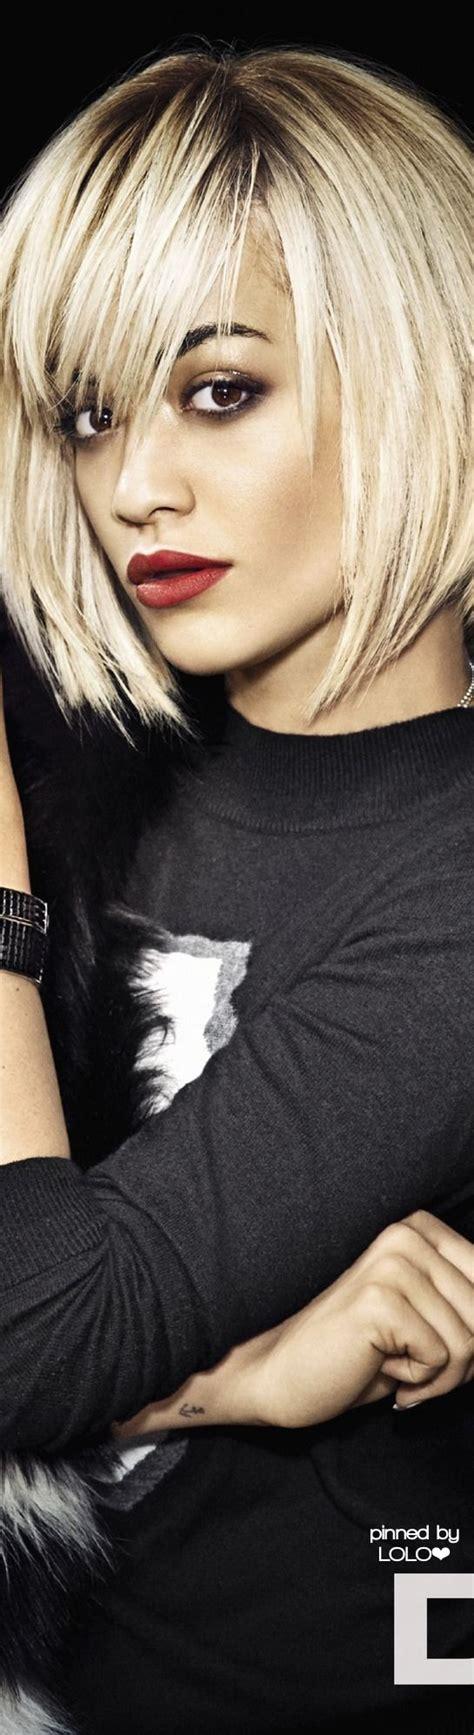 bob haircuts nyc rita ora for dkny by urban studio nyc lolo female